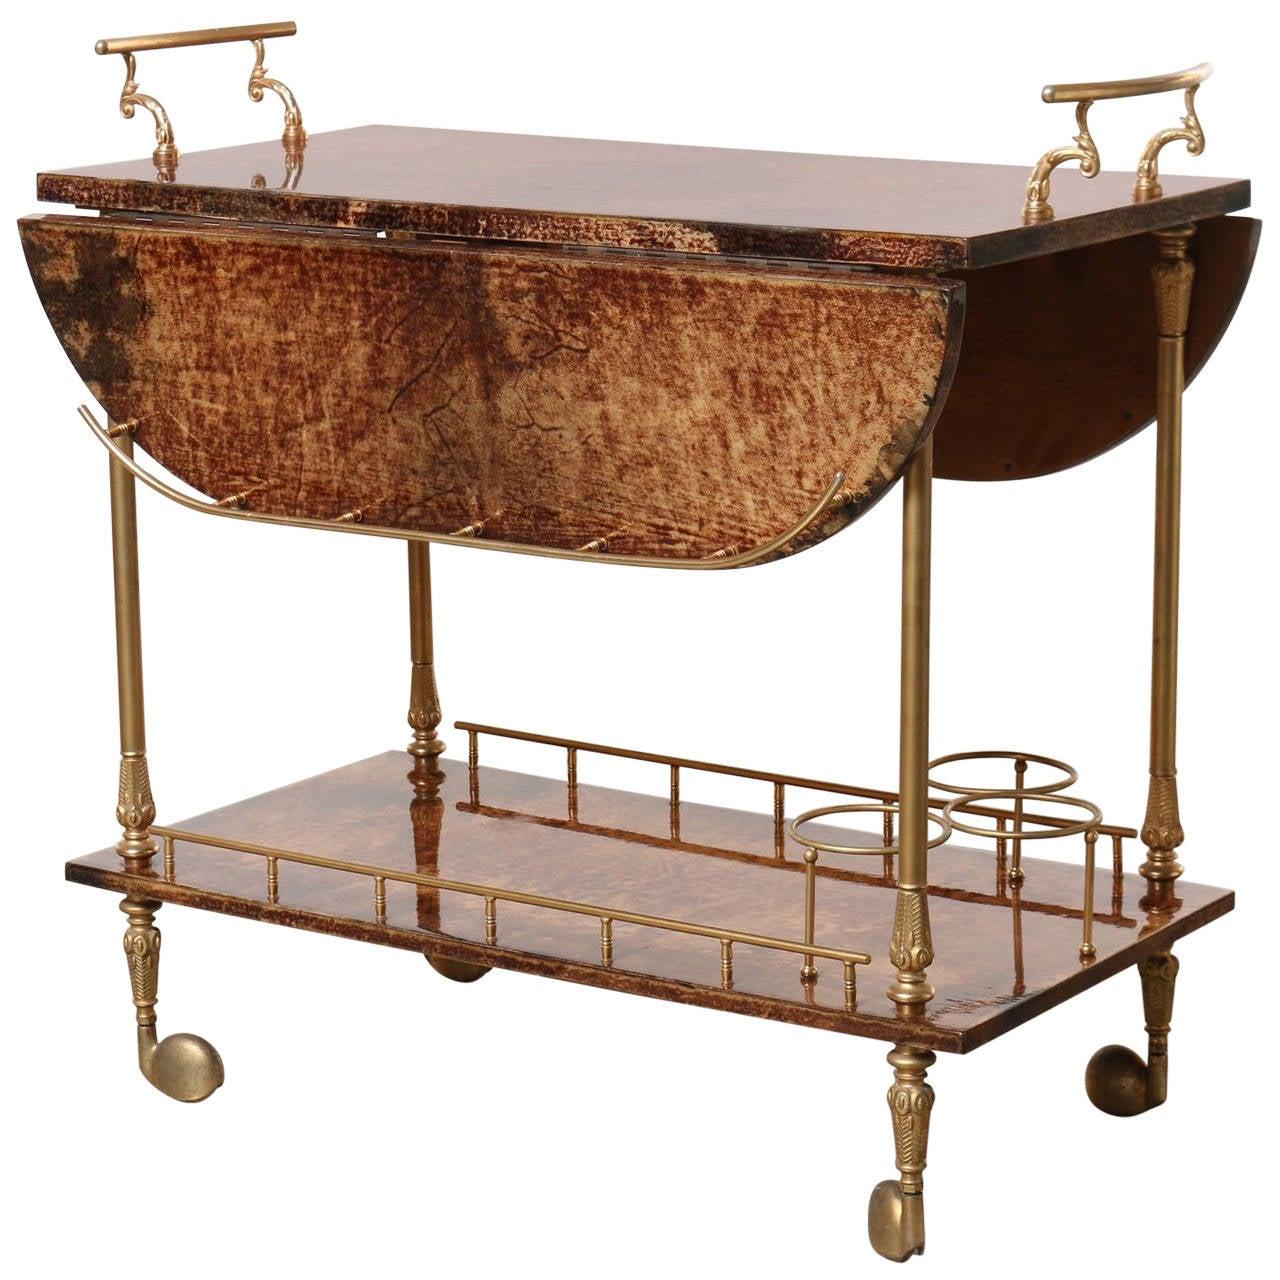 Original Aldo Tura Two Tier Rolling Serving Cart Brass